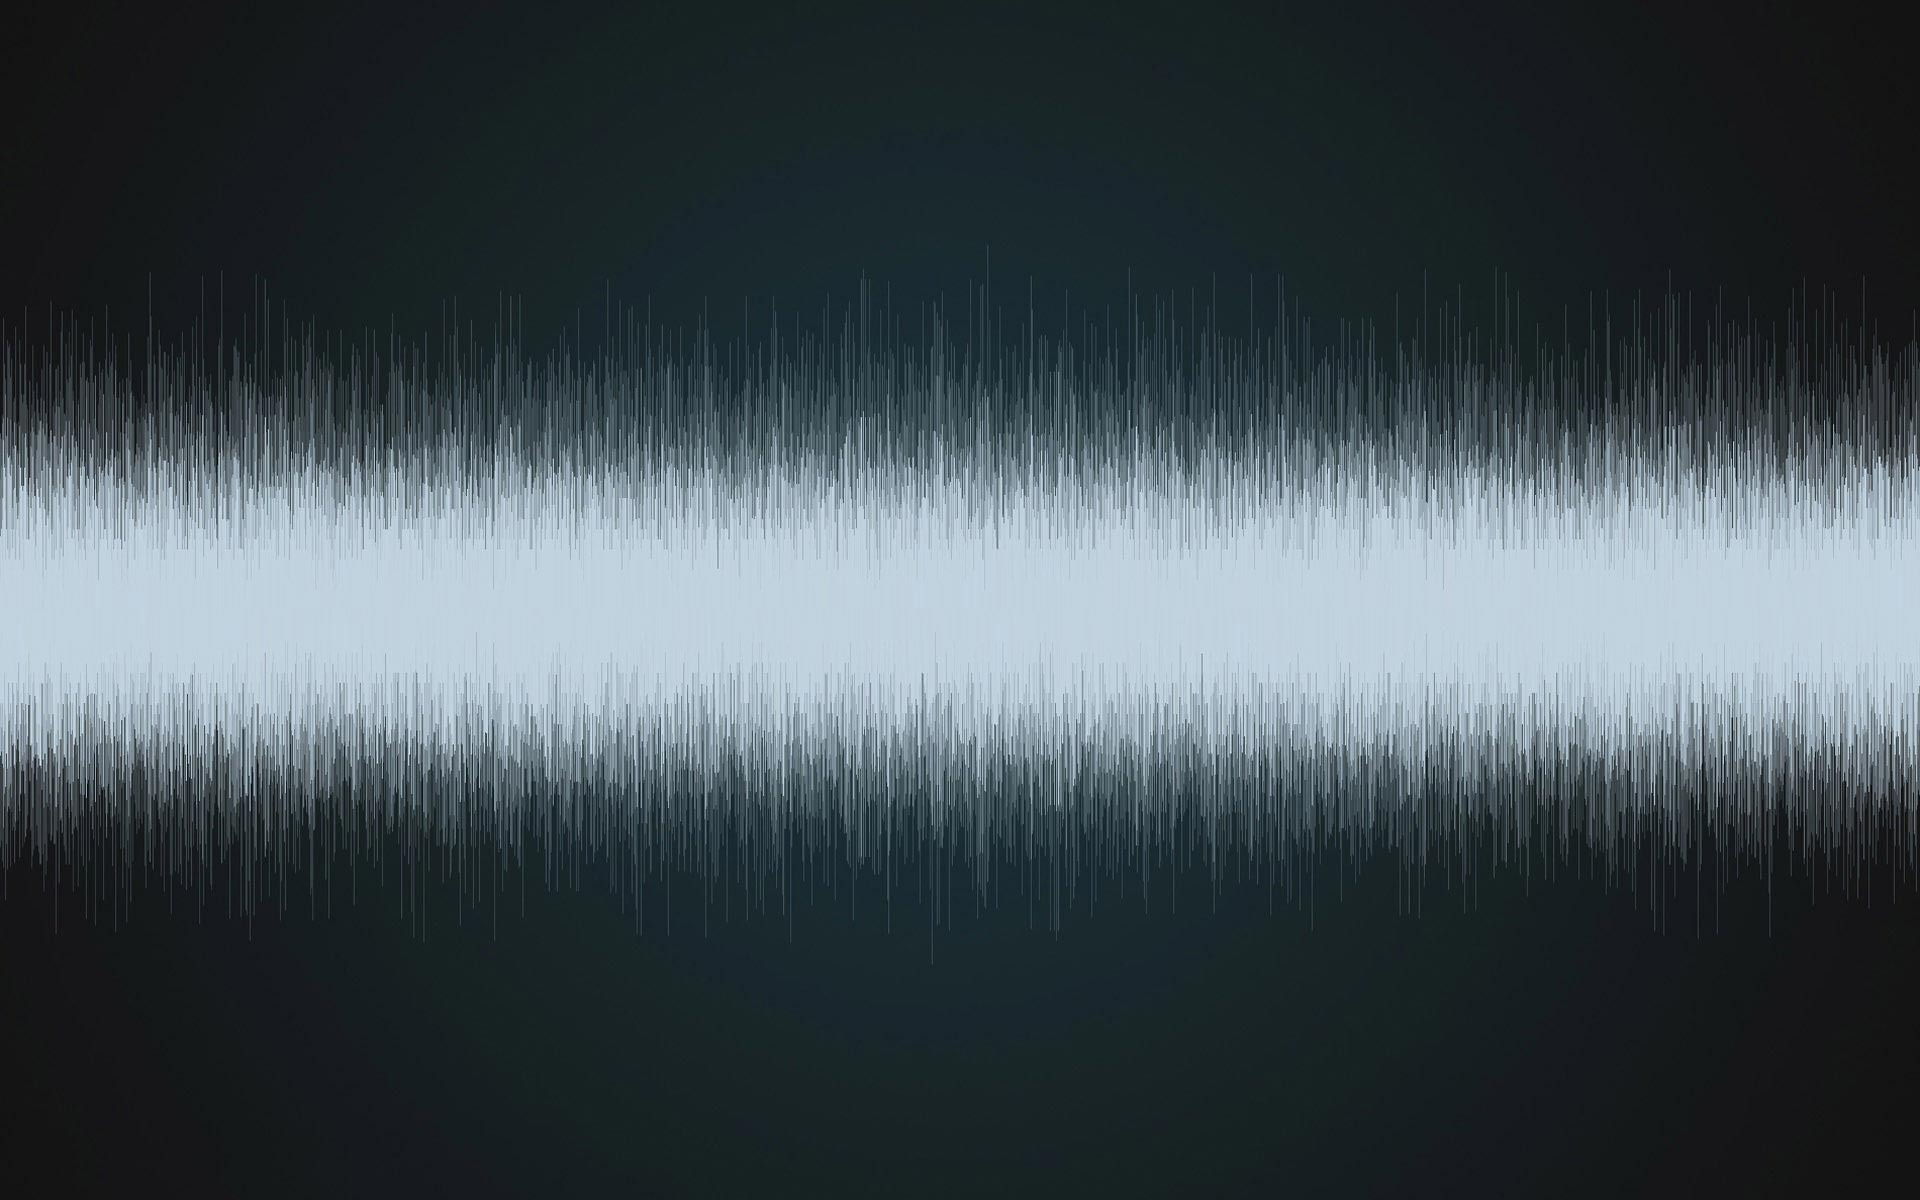 Sound waves wallpaper 194 1920x1200